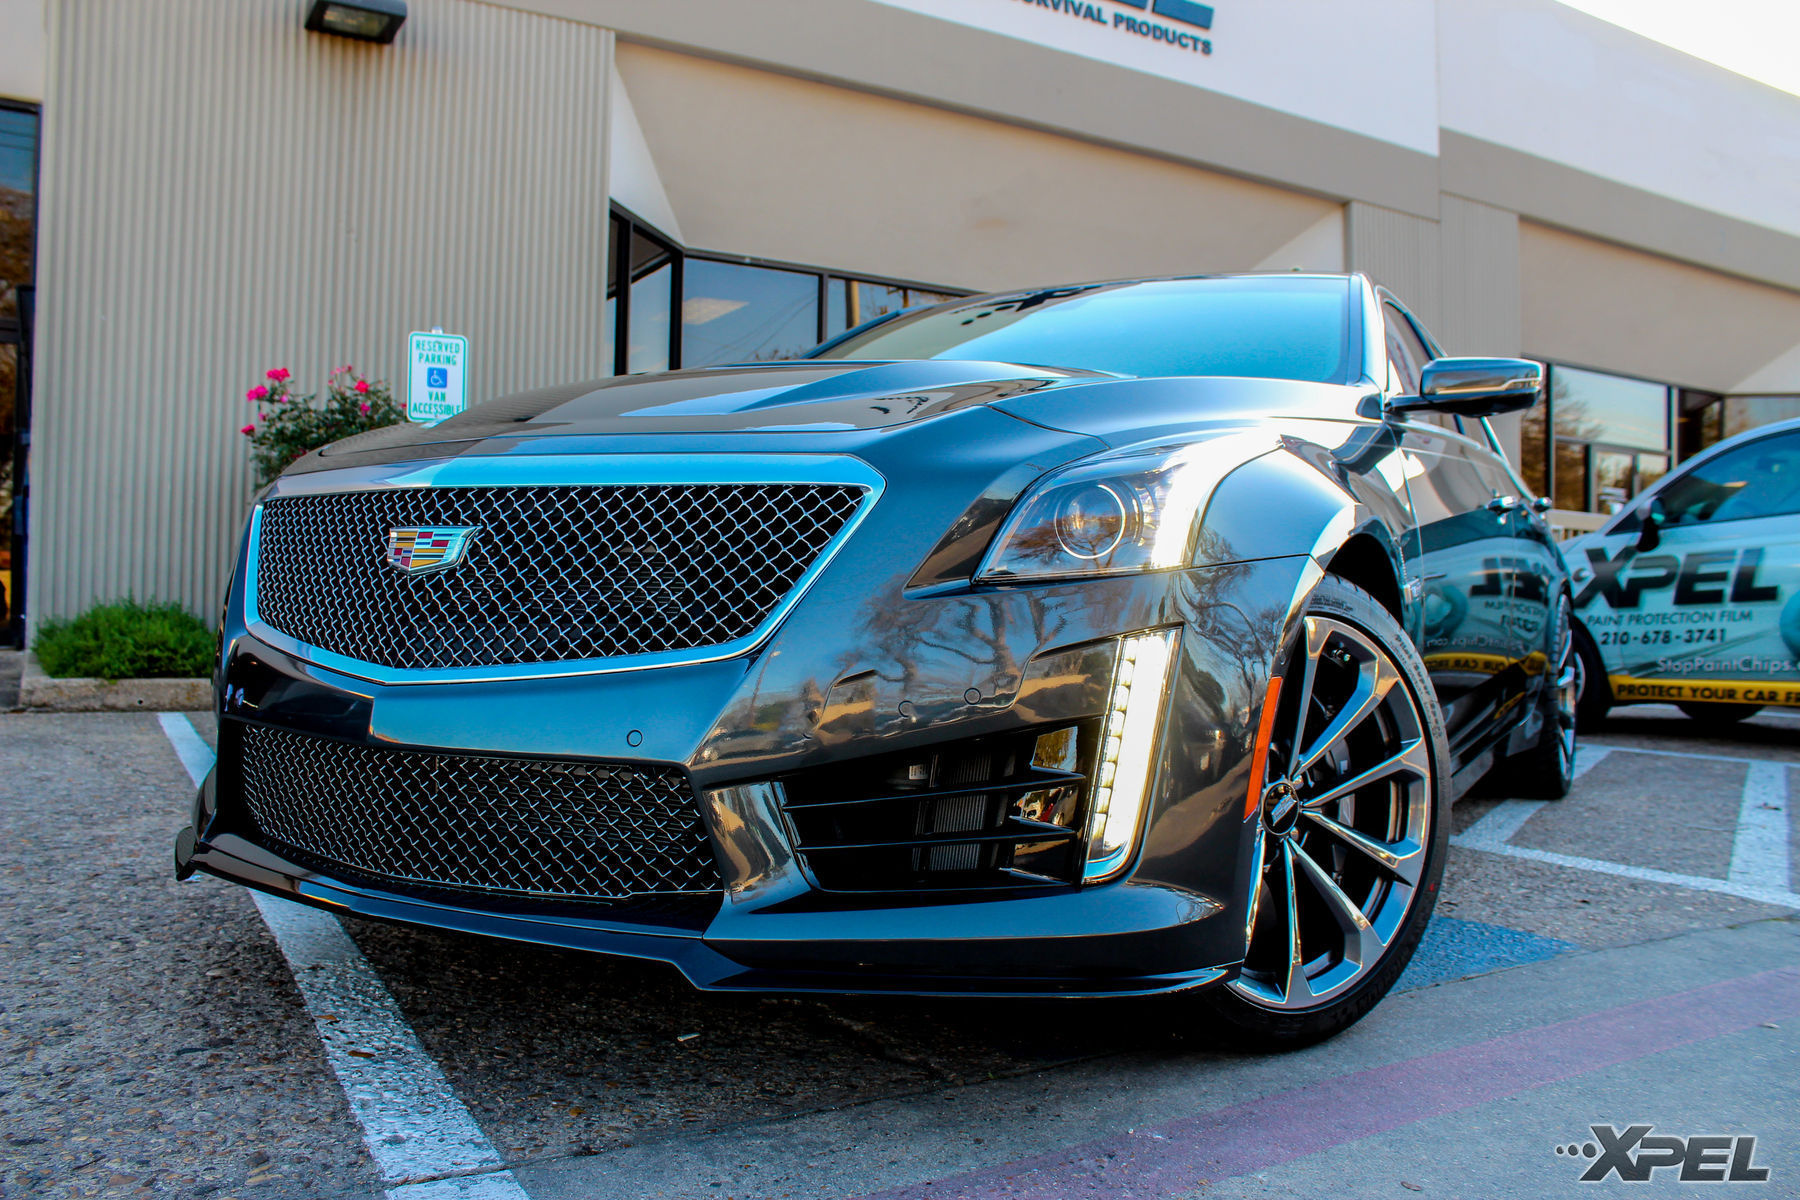 2016 Cadillac CTS-V | 2016 Cadillac CTS-V protected with XPEL ULTIMATE